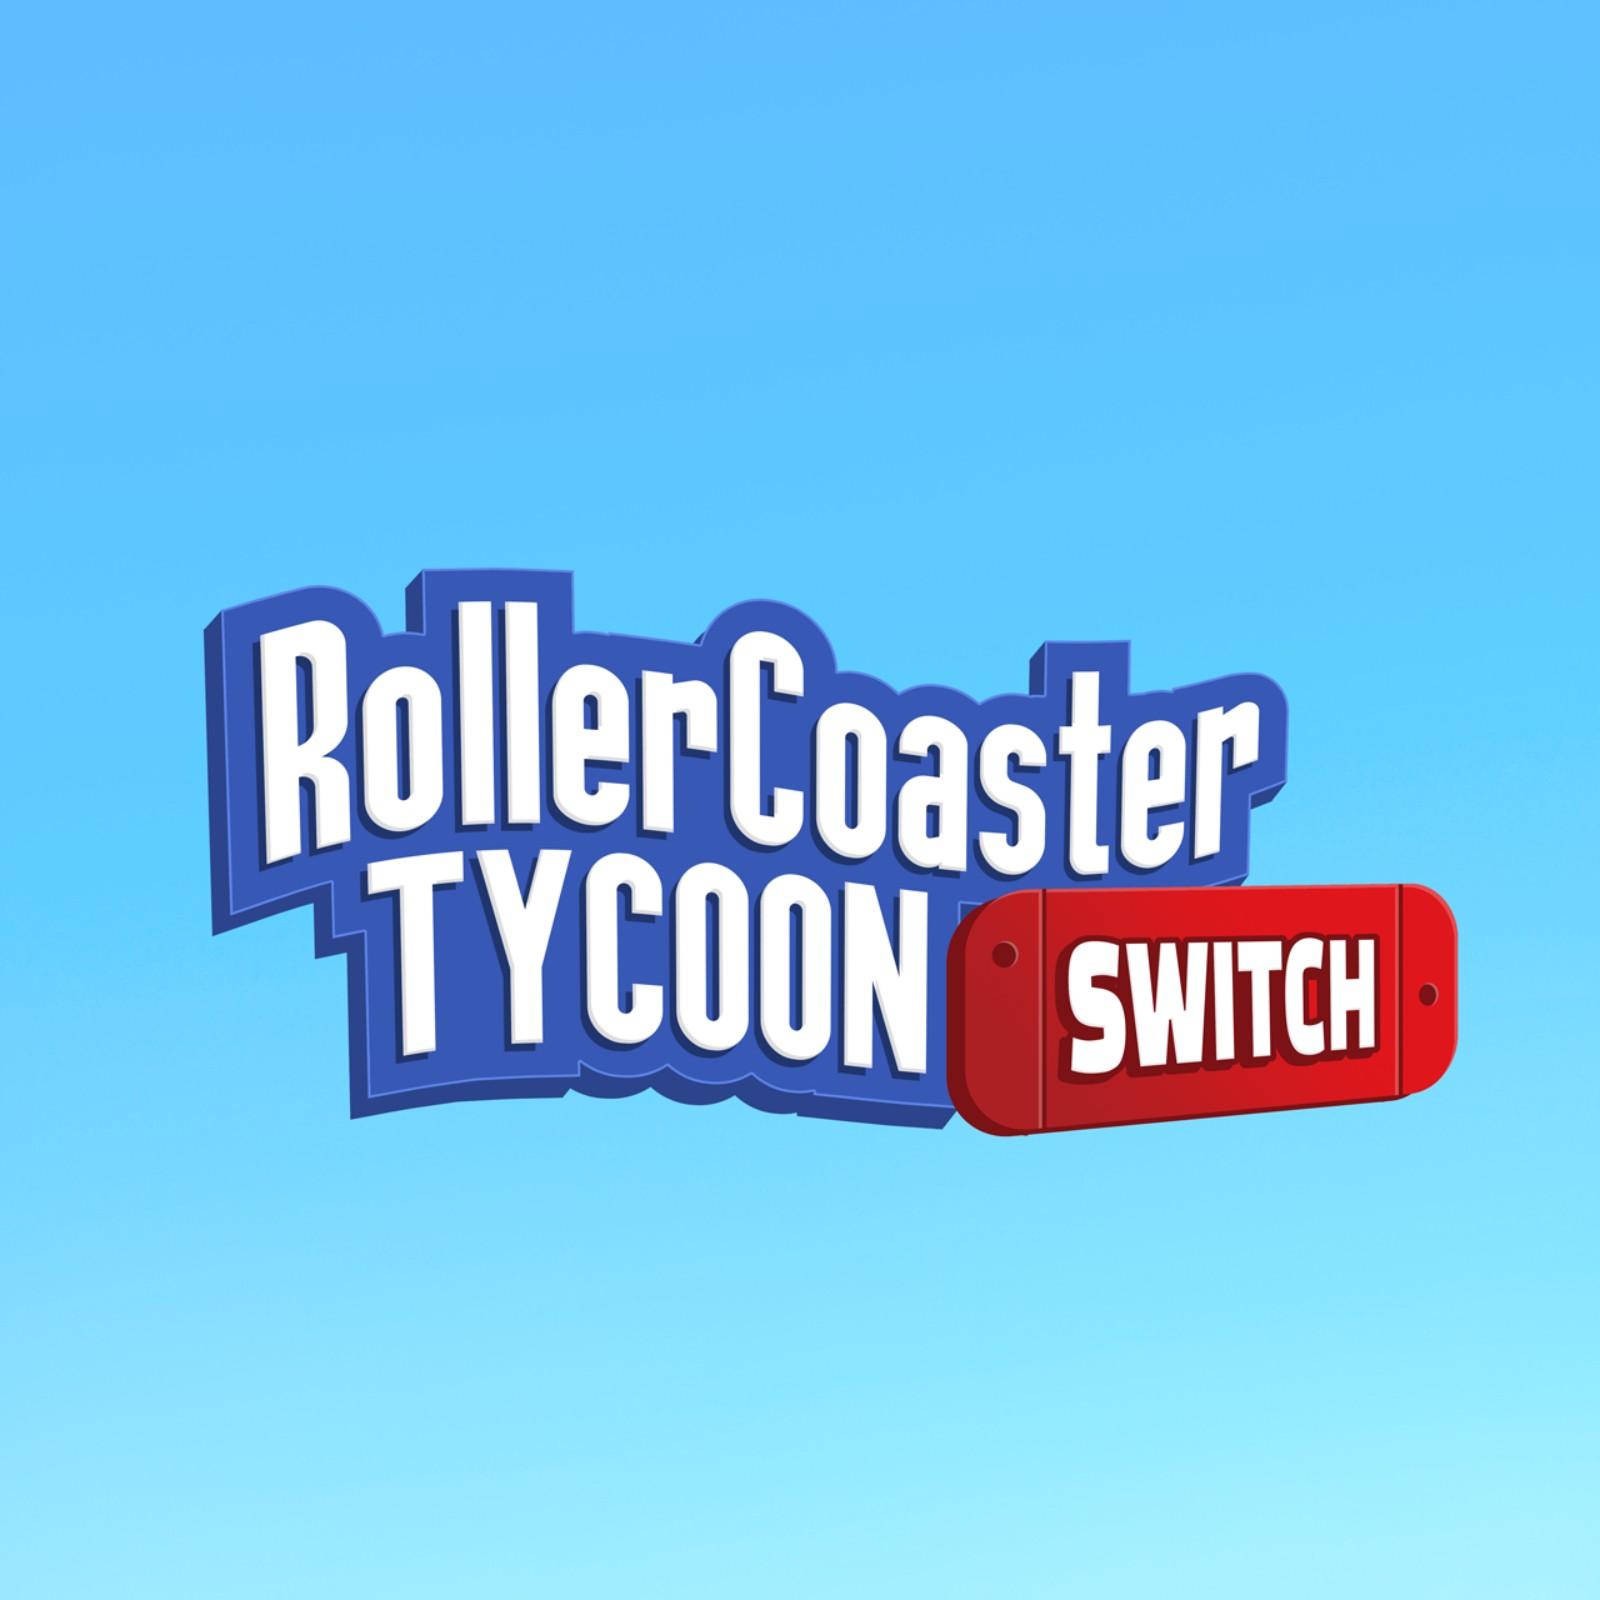 roller coaster tycoon 3 gamefaqs